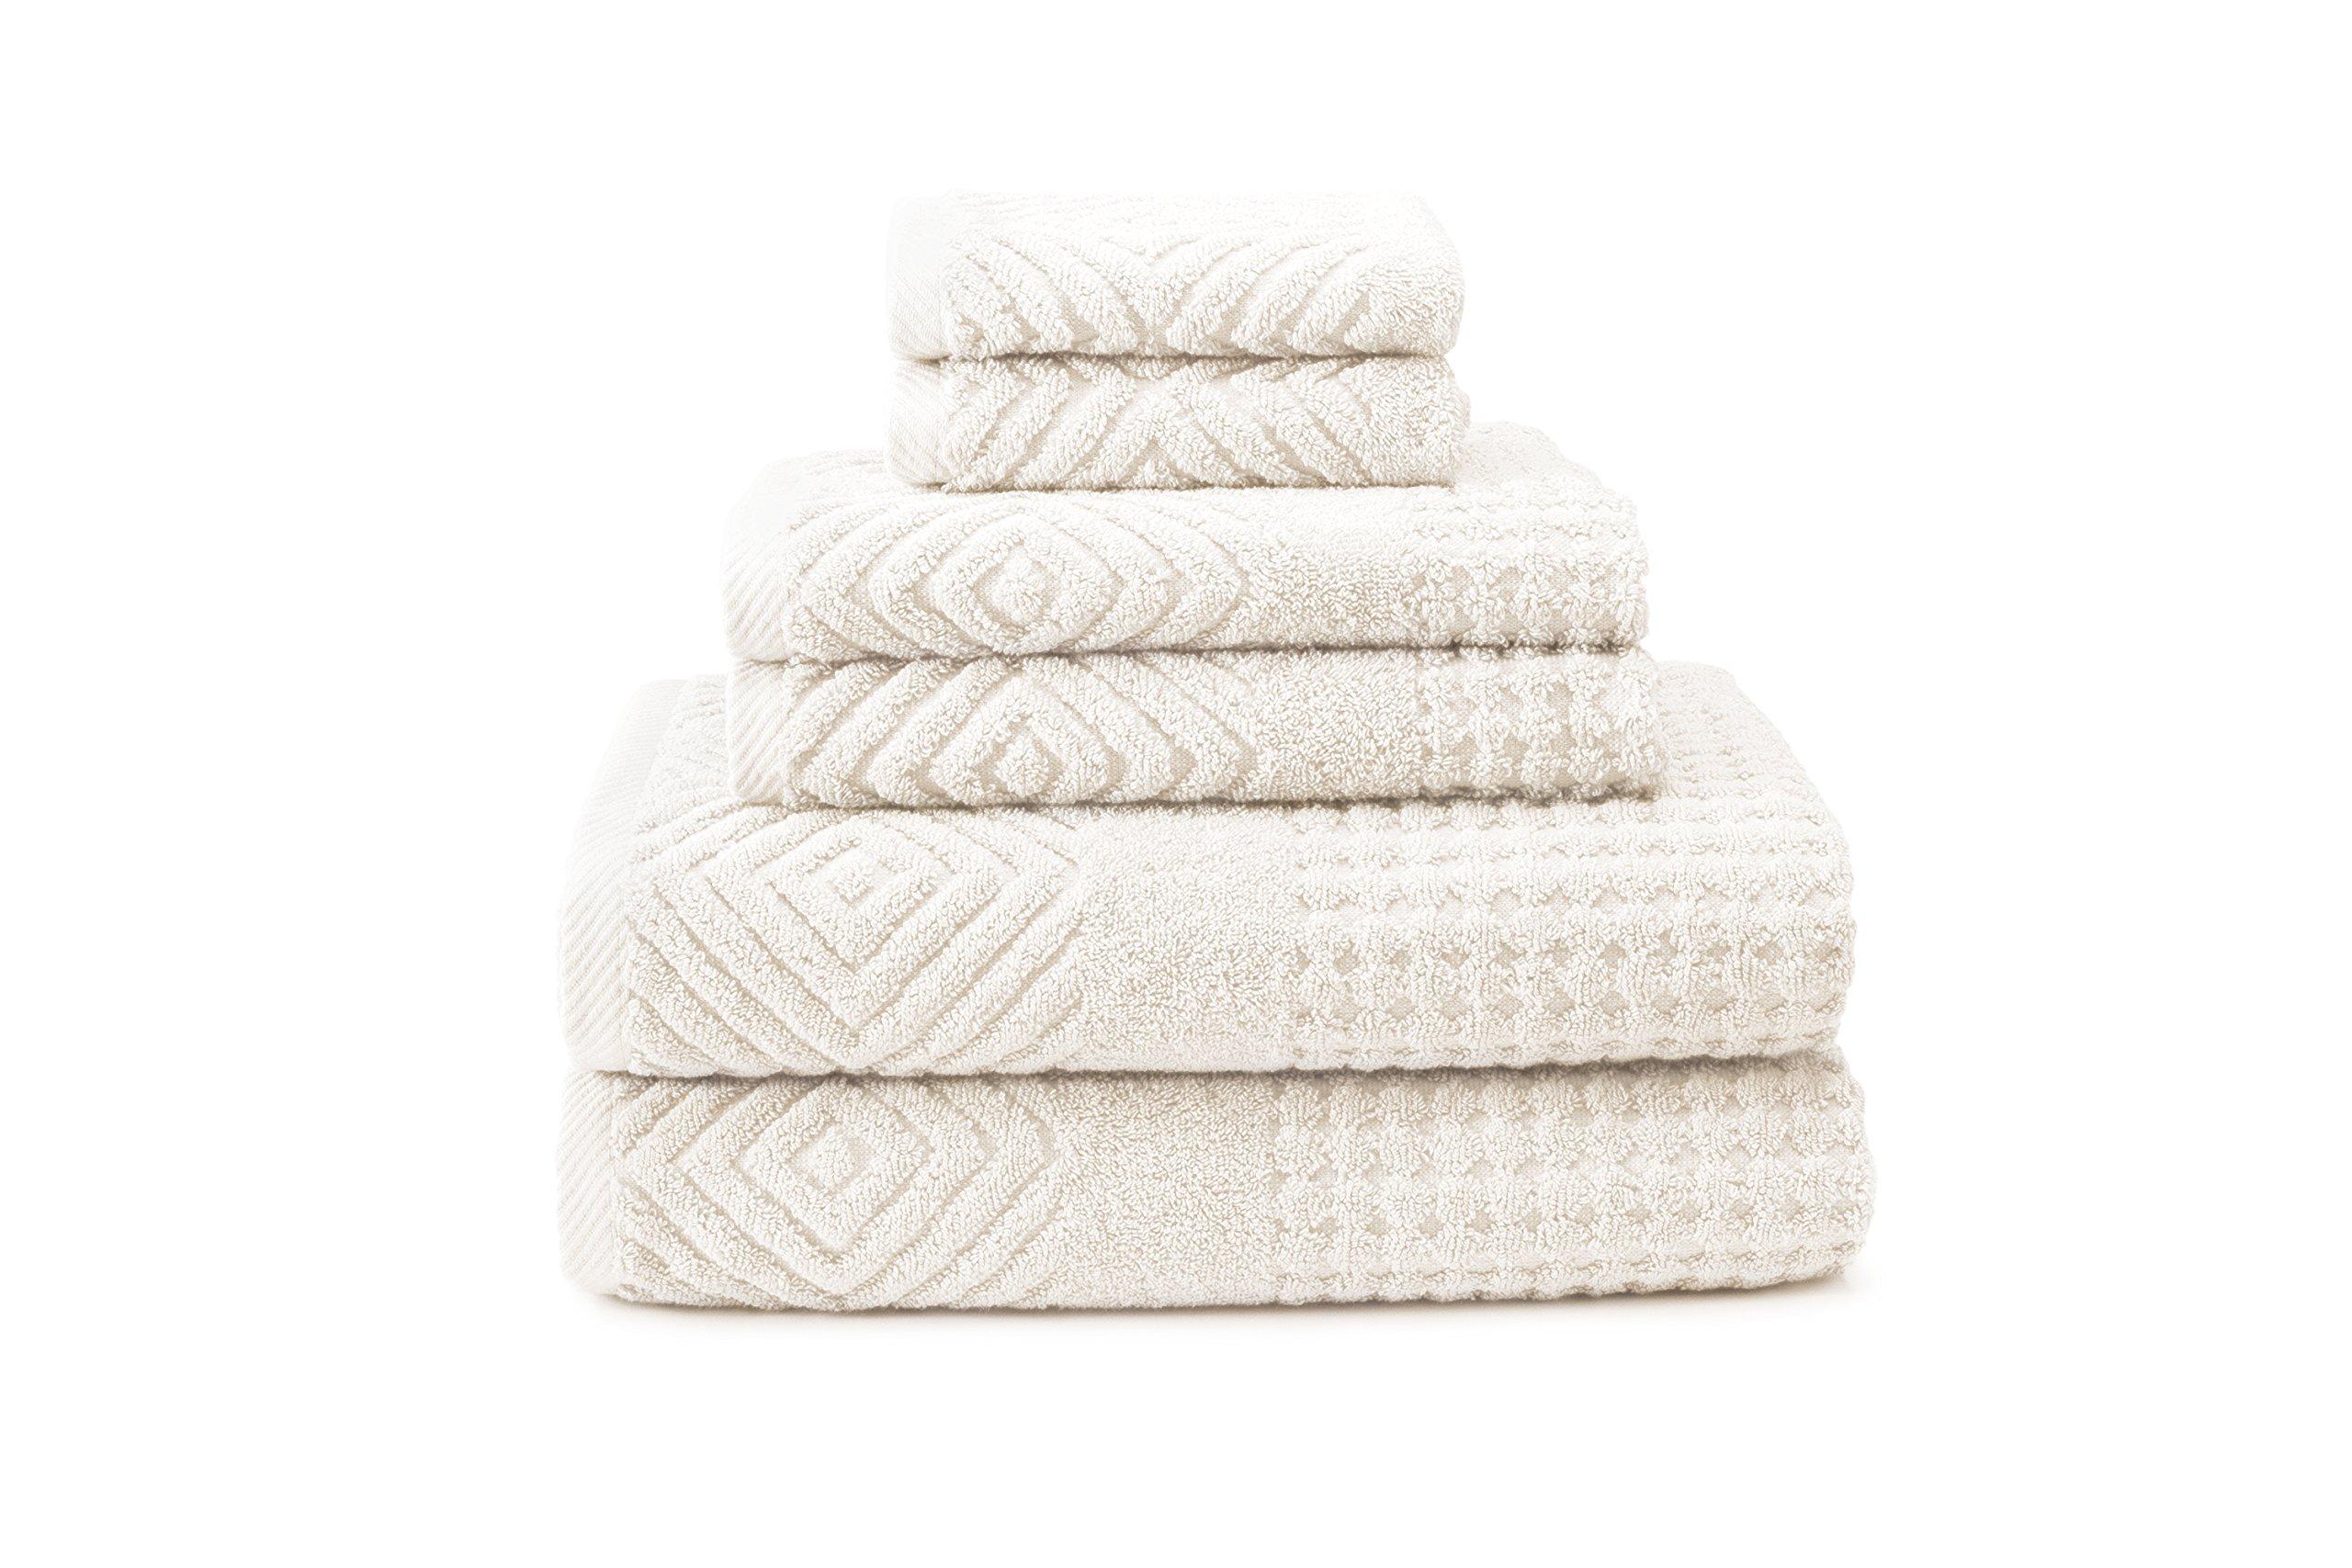 Luxury Bath Towel Set - 100 Percent Organic Cotton Towels - Soft Bathroom Towel Set (6-Piece Set, Cream)